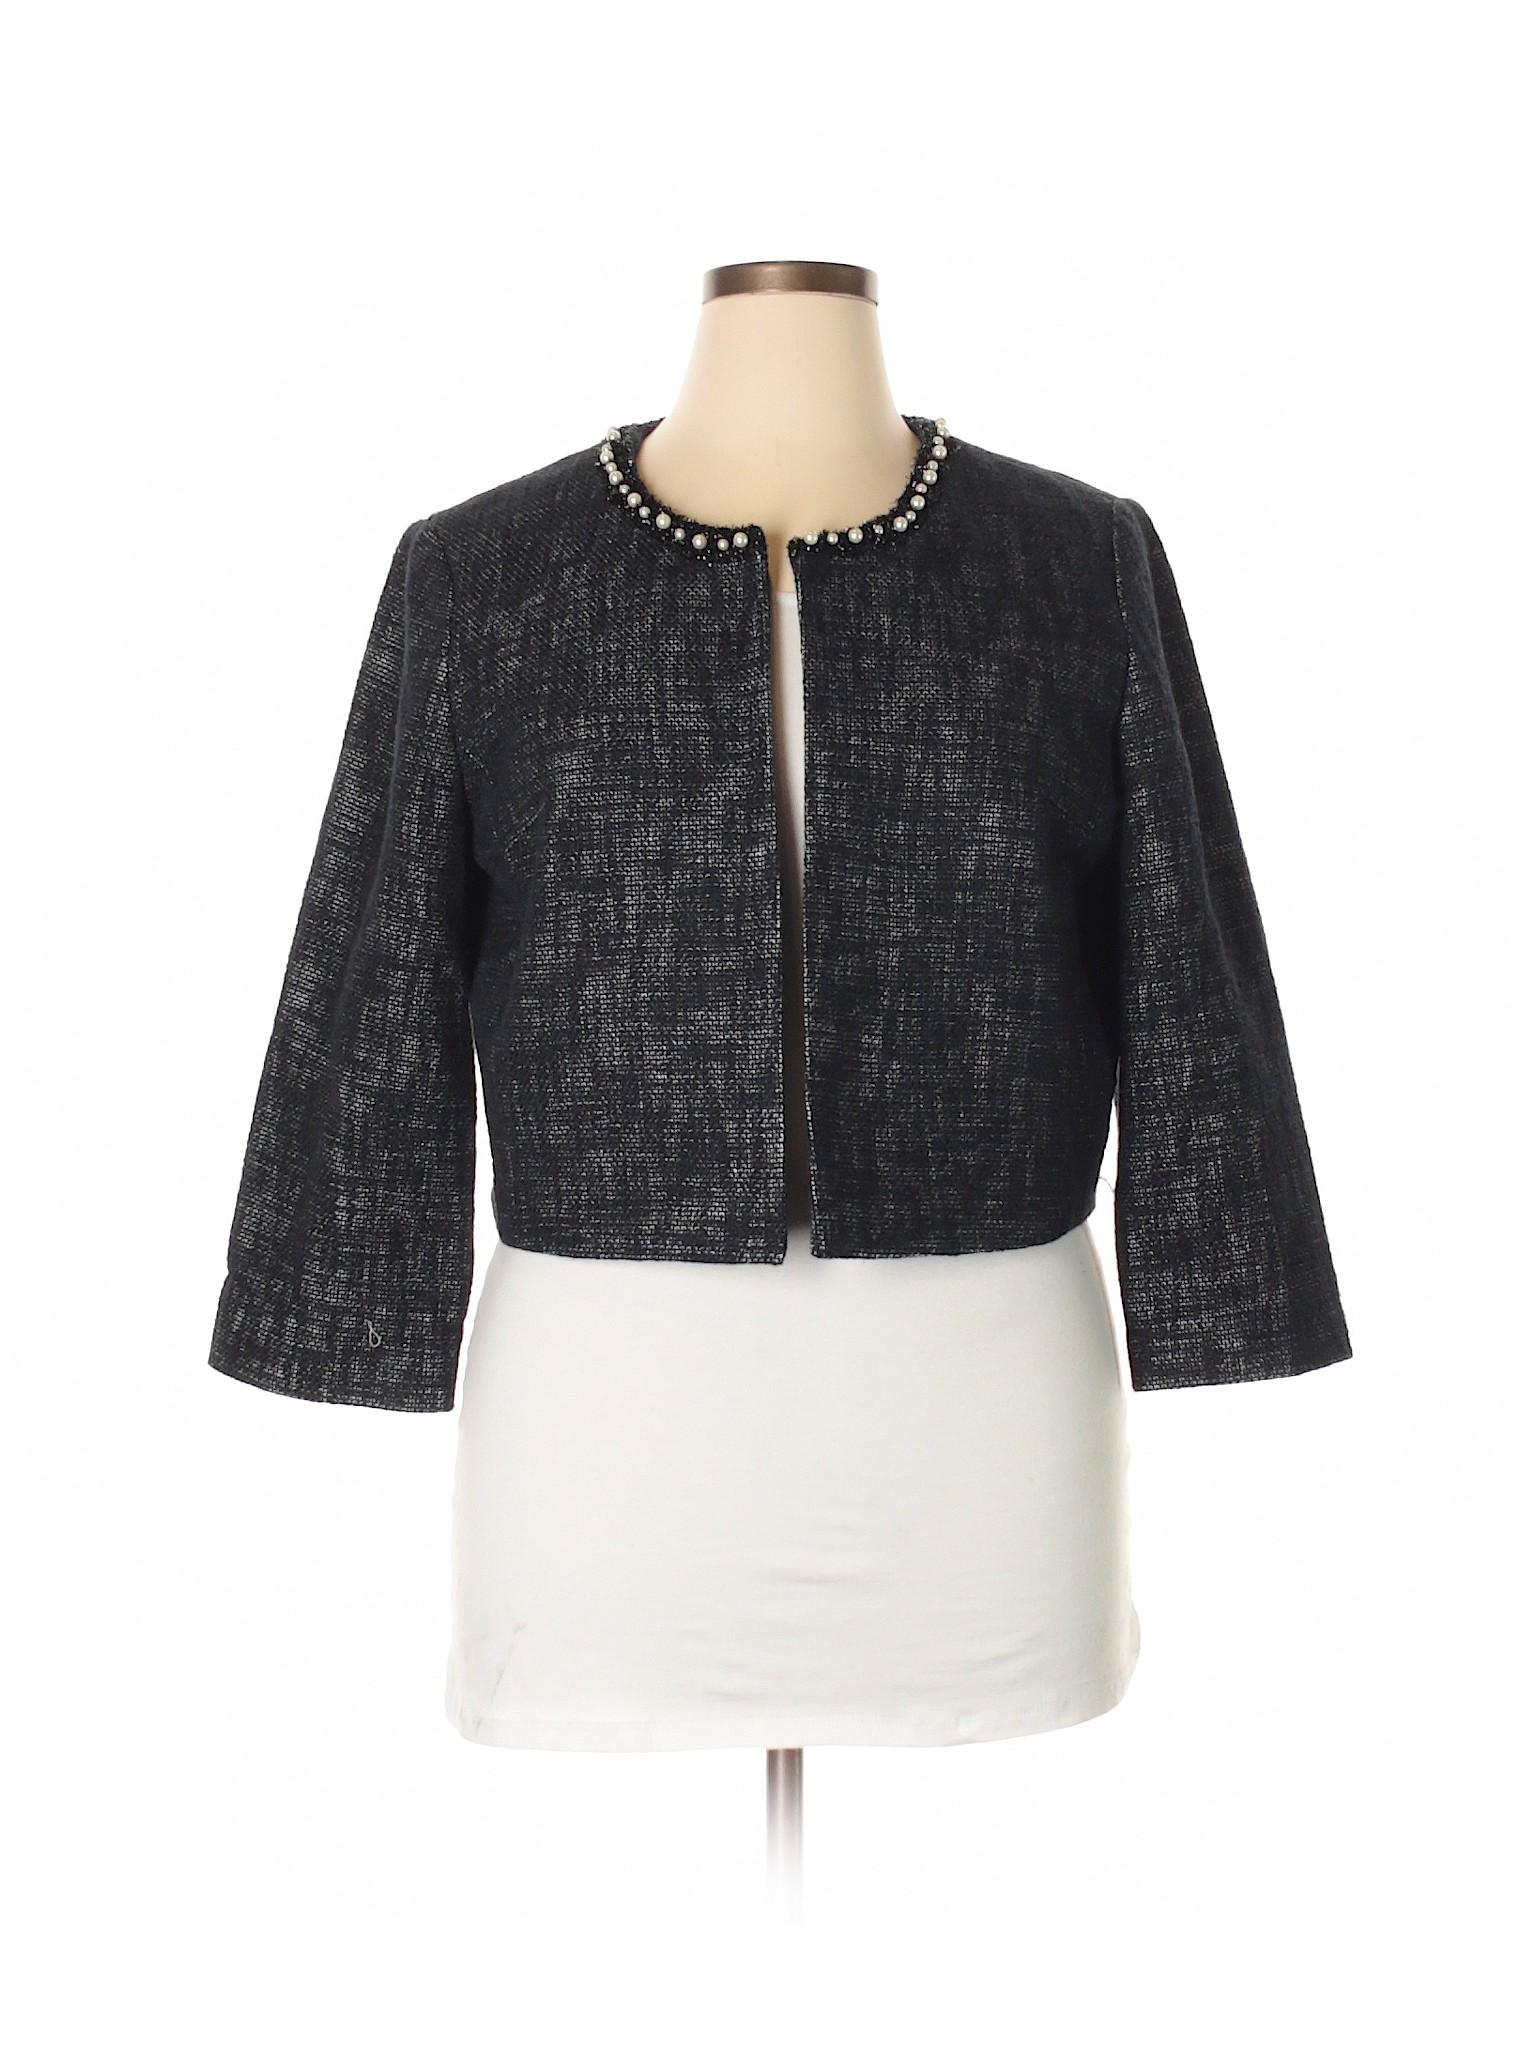 winter Lagerfeld Jacket Karl Paris Boutique Zdwq4fX4